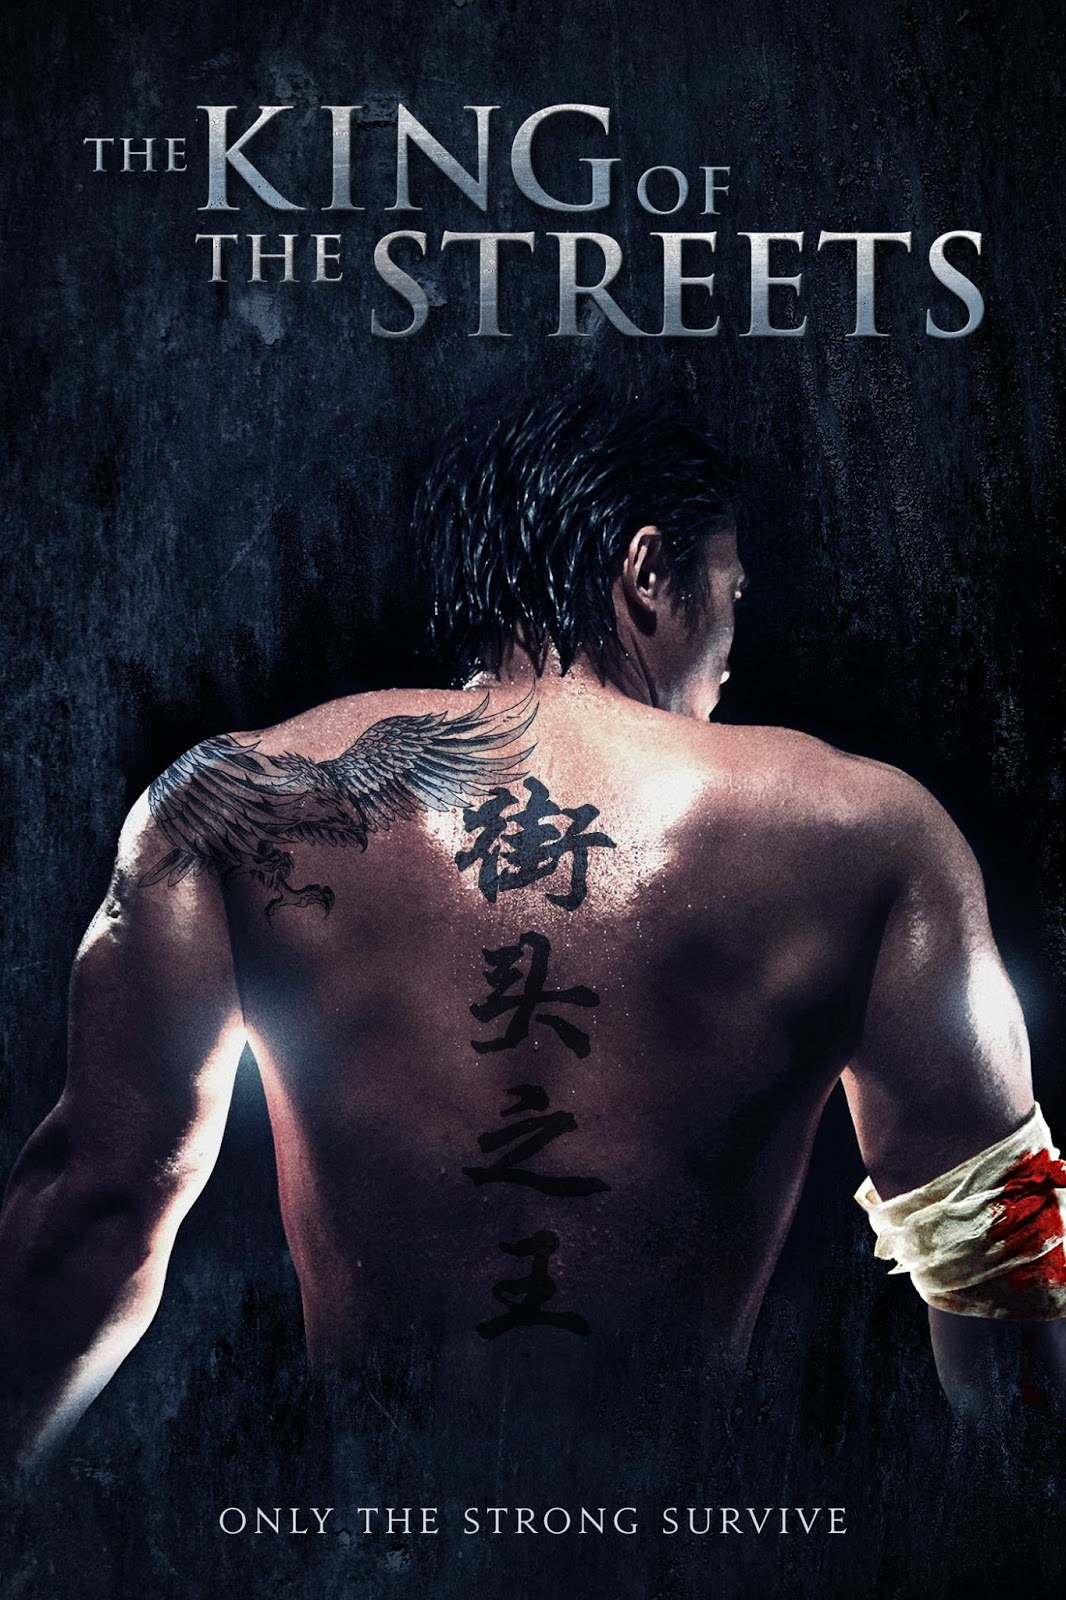 The King of The Streets ซัดไม่เลือกหน้า ฆ่าไม่เลือกพวก [HD][พากย์ไทย]